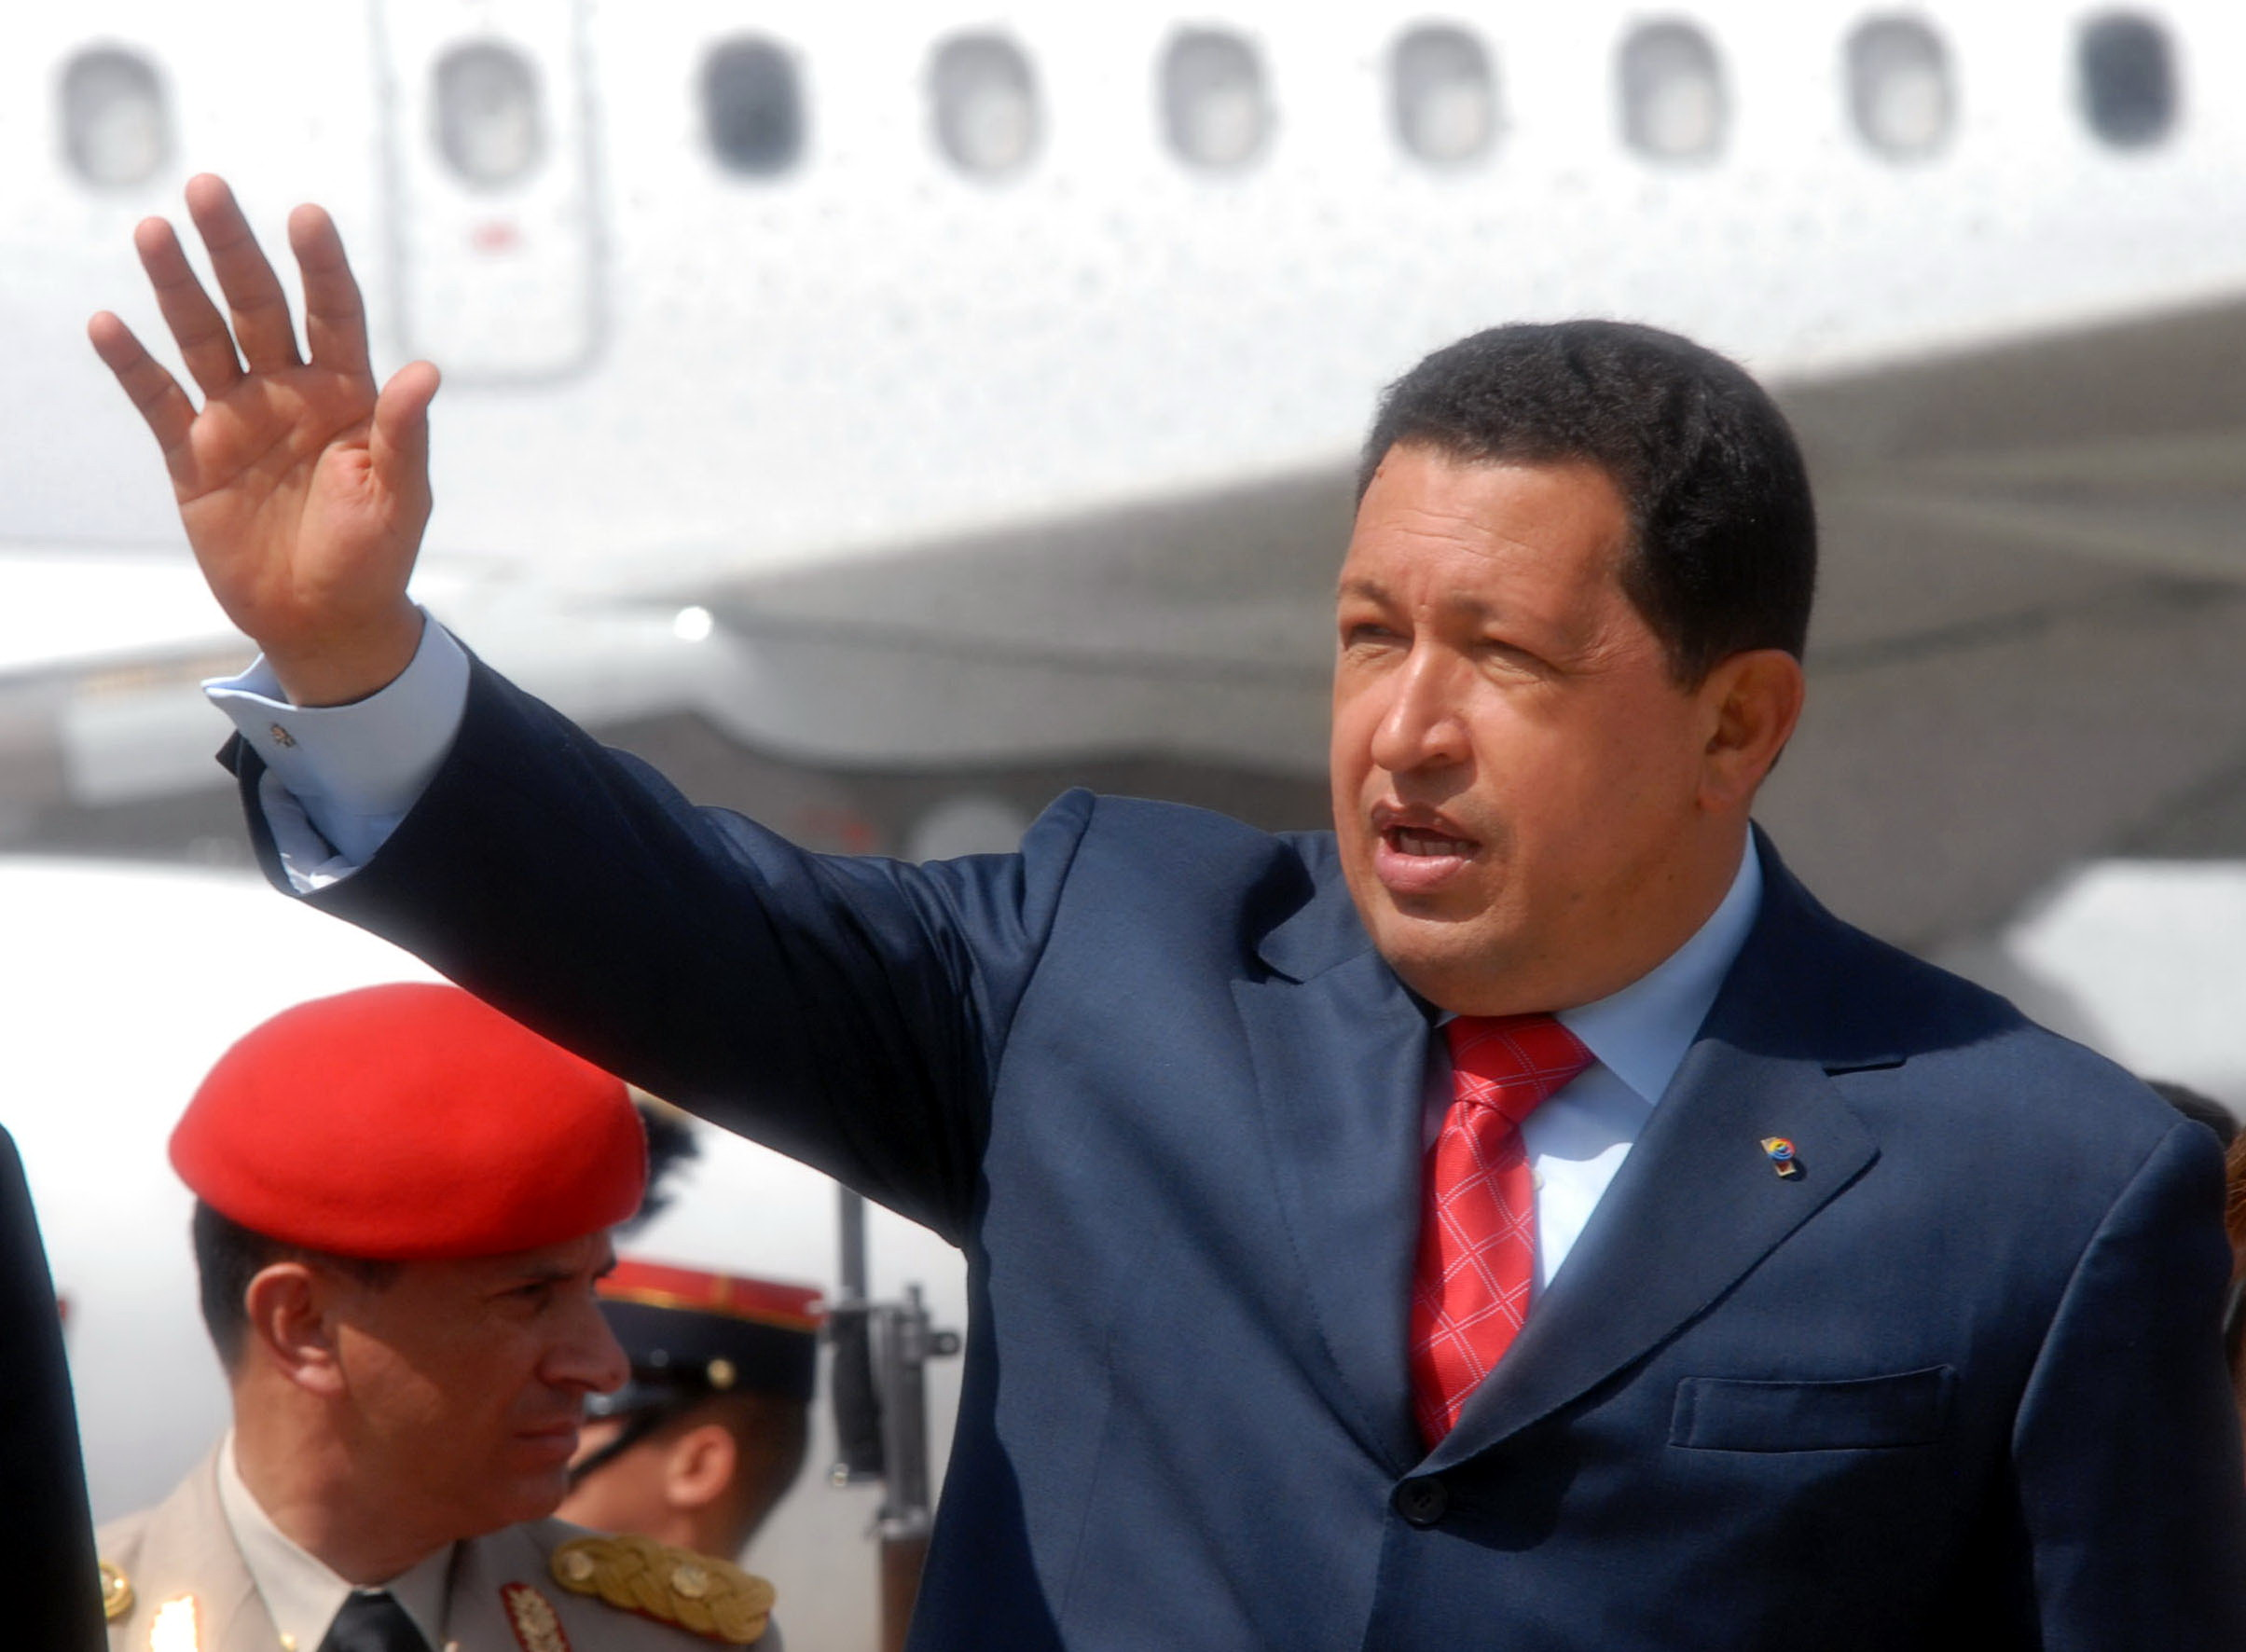 Hugo Chávez: Frases célebres - Voces The Huffington Post